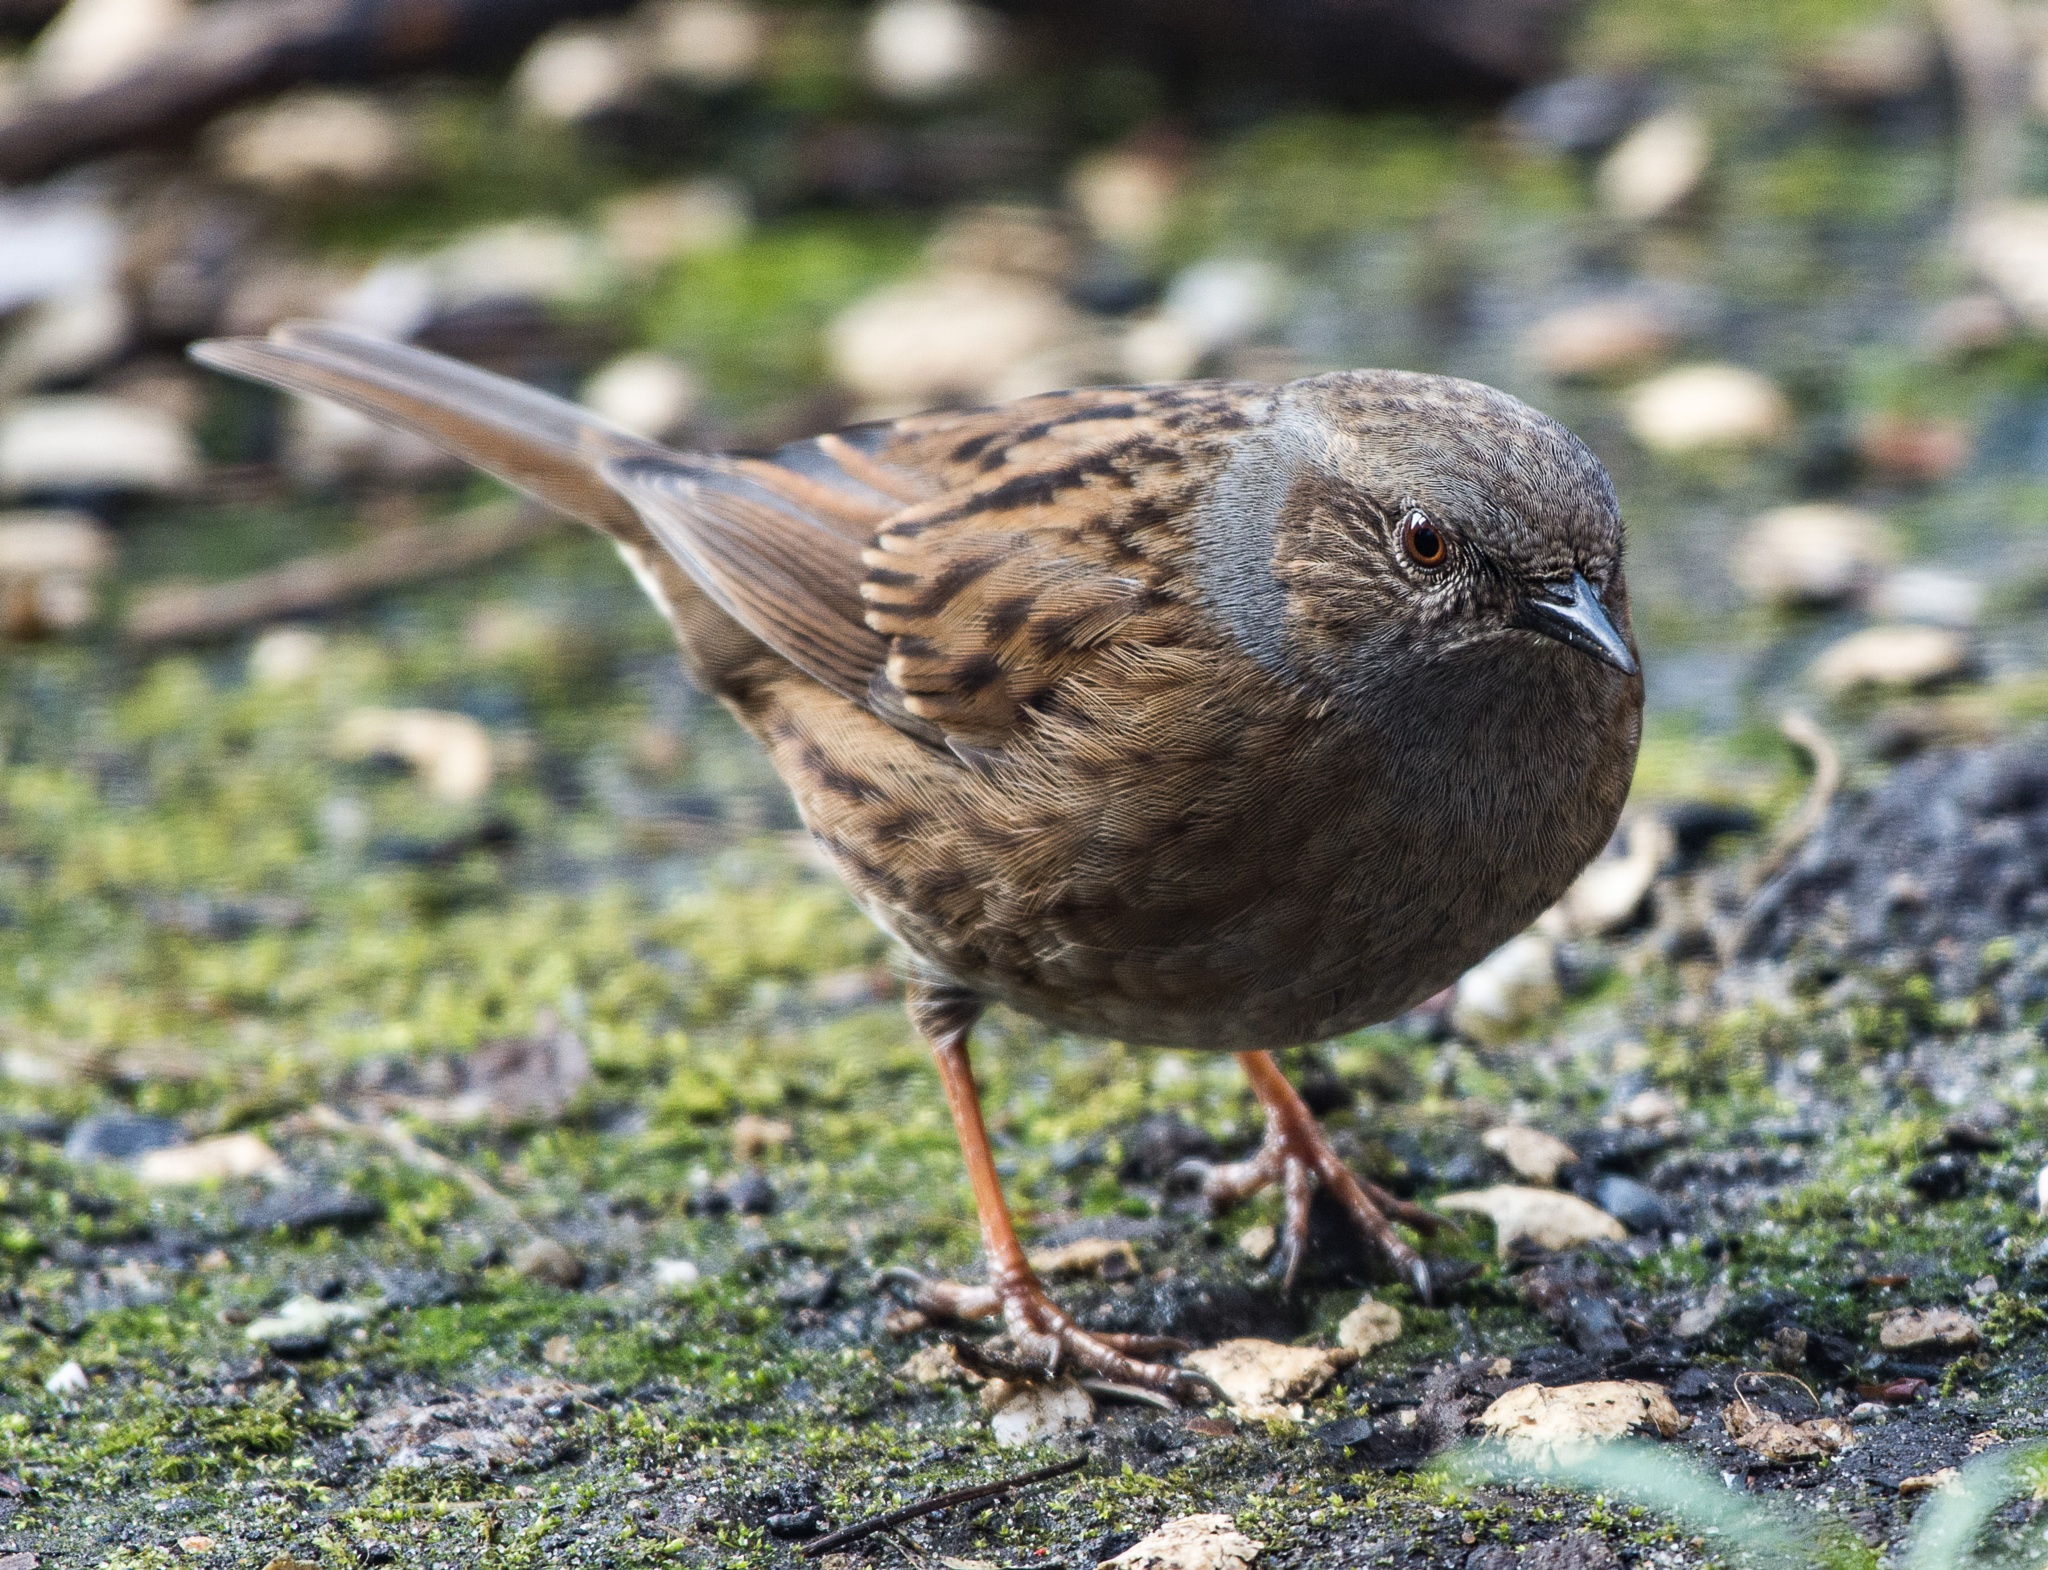 Hedge sparrow by ETWEL